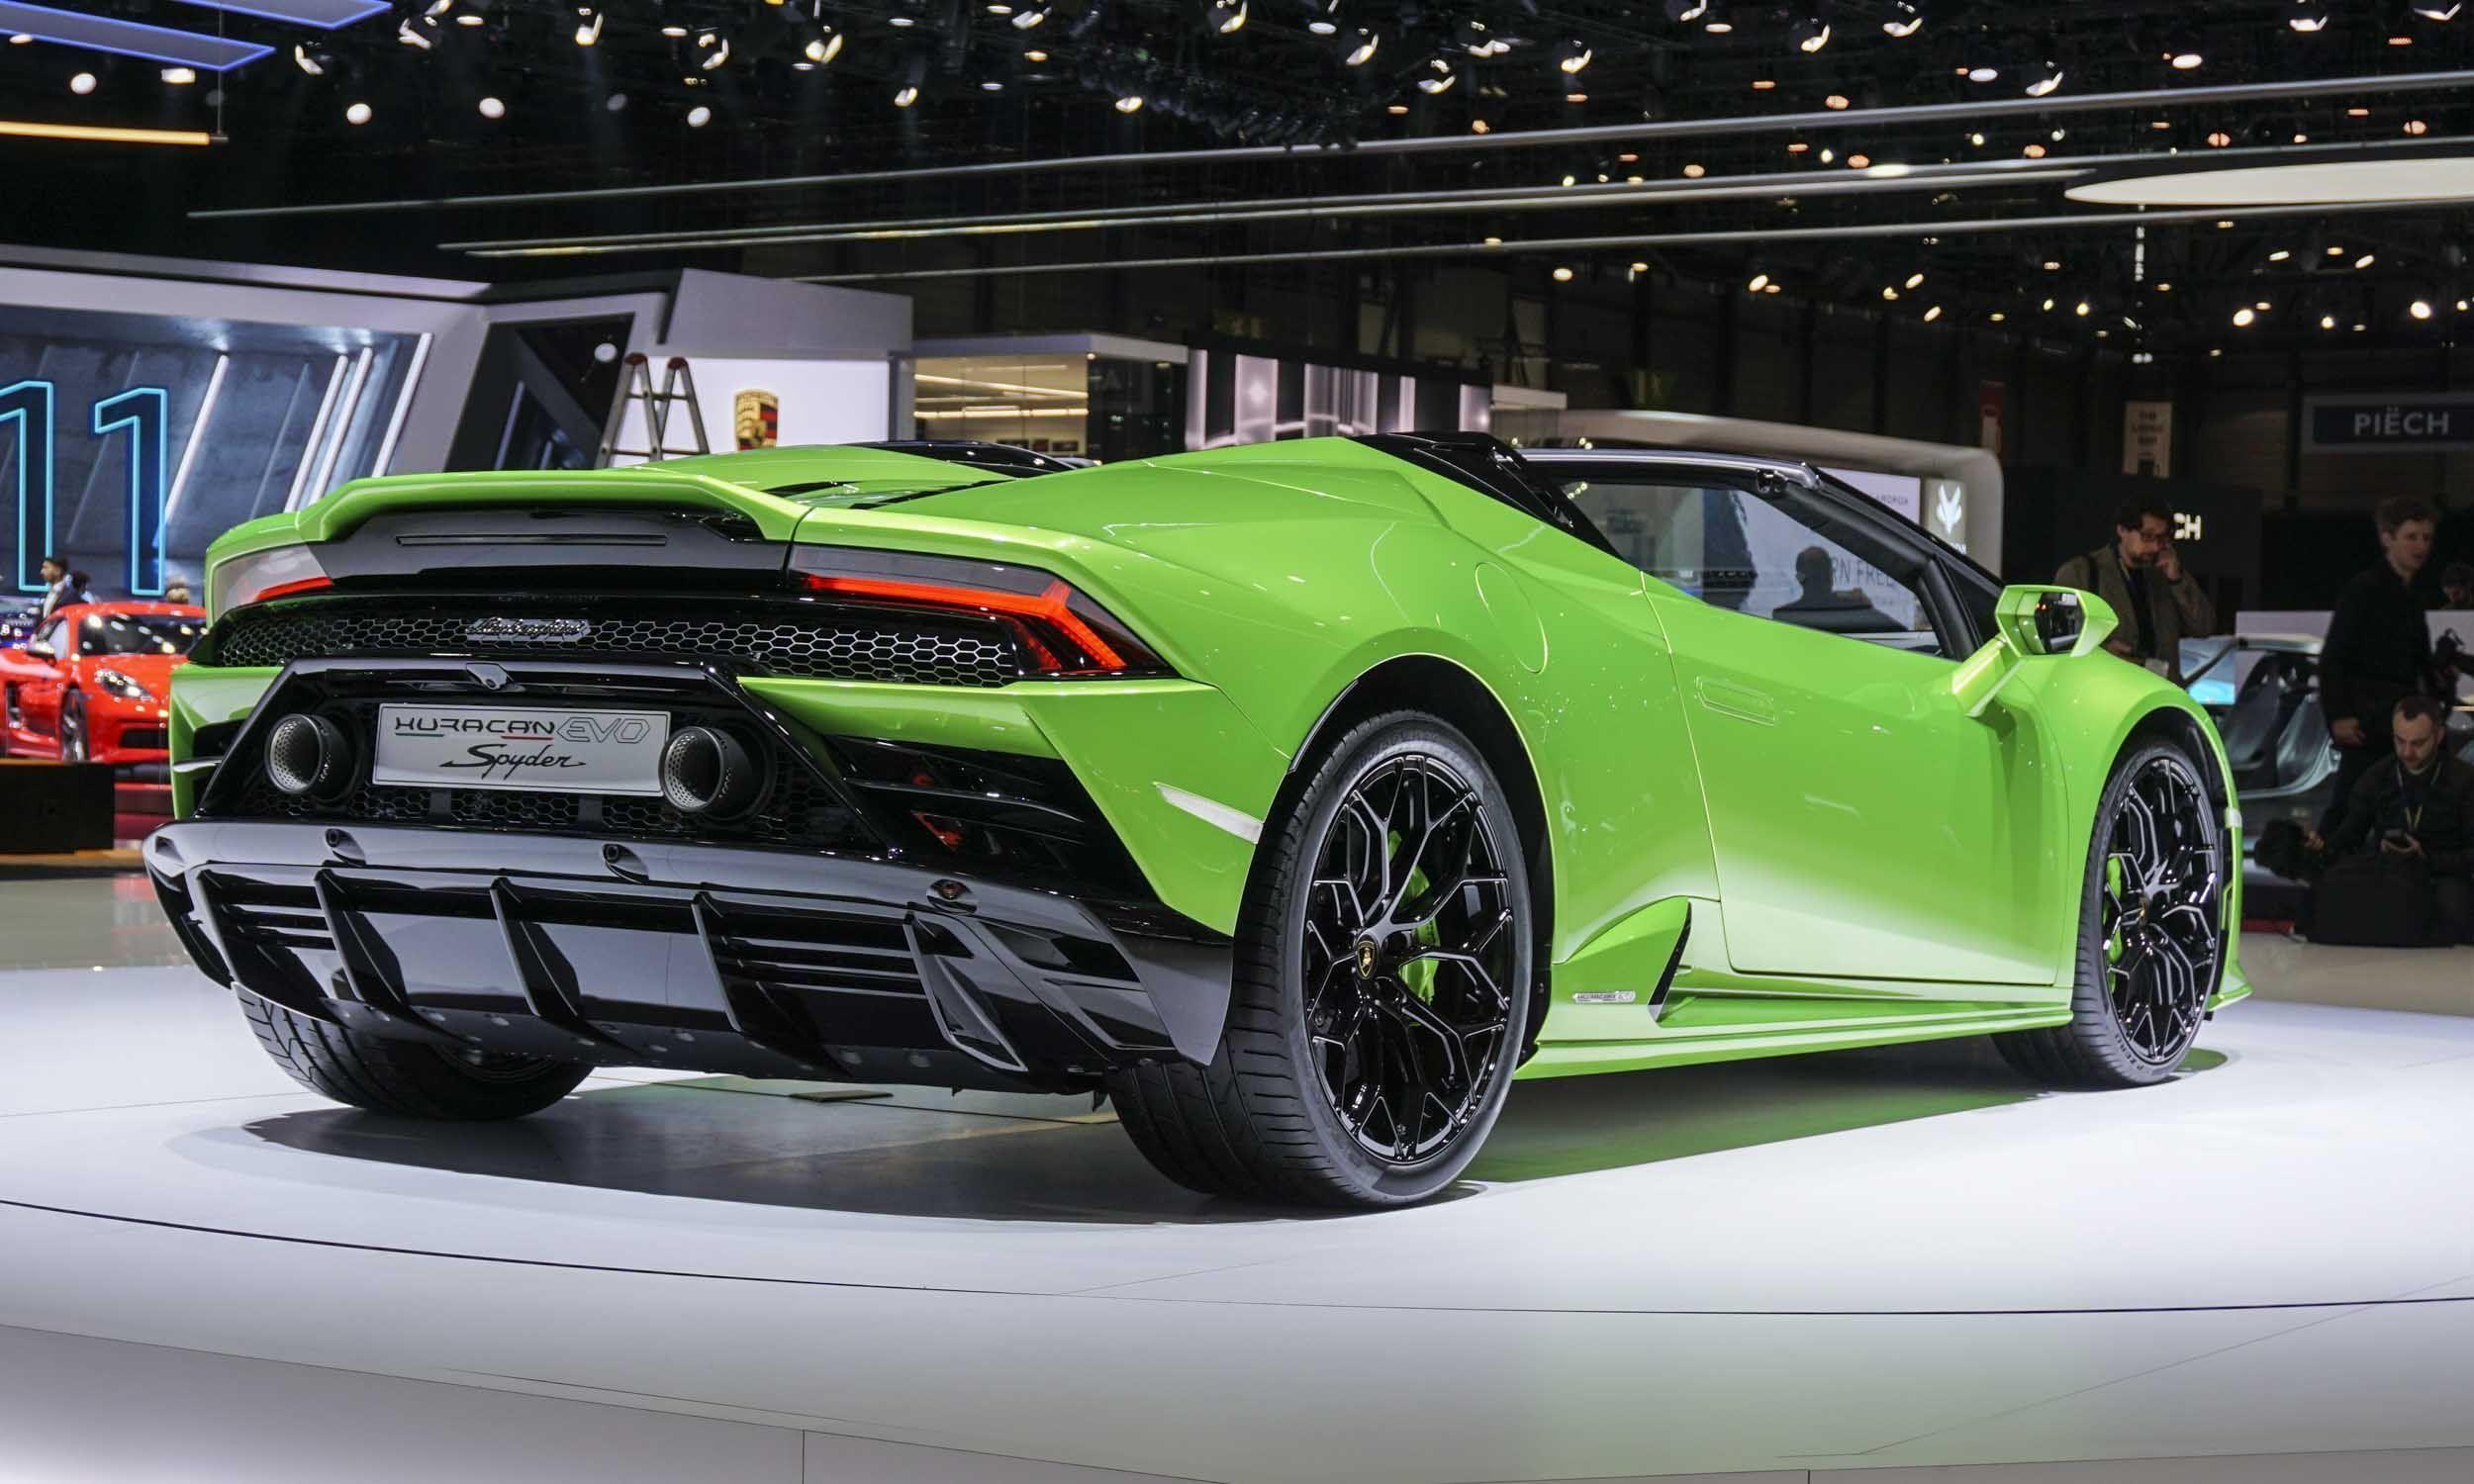 Lamborghini Huracan EVO Spyder #lamborghinihuracan Lamborghini Huracan EVO Spyder #lamborghinihuracan Lamborghini Huracan EVO Spyder #lamborghinihuracan Lamborghini Huracan EVO Spyder #lamborghinihuracan Lamborghini Huracan EVO Spyder #lamborghinihuracan Lamborghini Huracan EVO Spyder #lamborghinihuracan Lamborghini Huracan EVO Spyder #lamborghinihuracan Lamborghini Huracan EVO Spyder #lamborghinihuracan